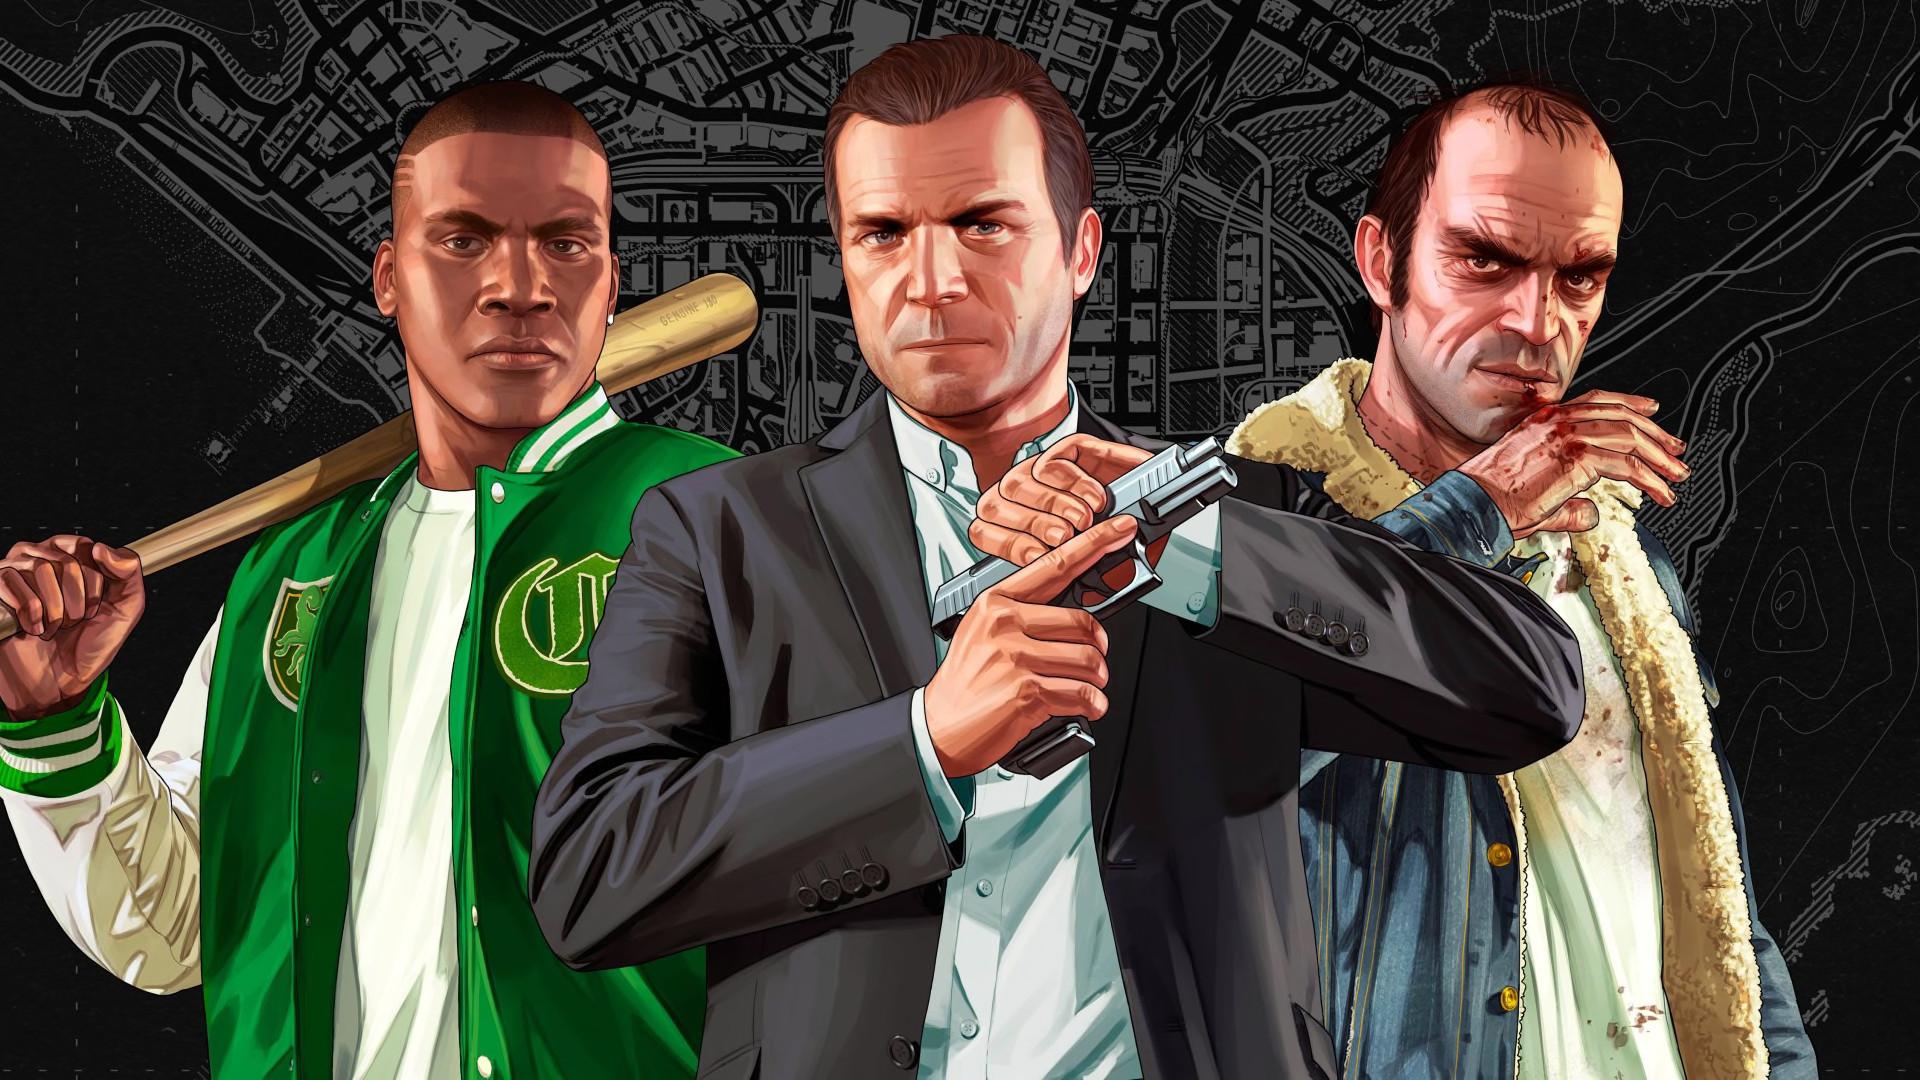 GTA V Has Sold 130 Million Units, Red Dead Redemption 2 Manages 31 Million